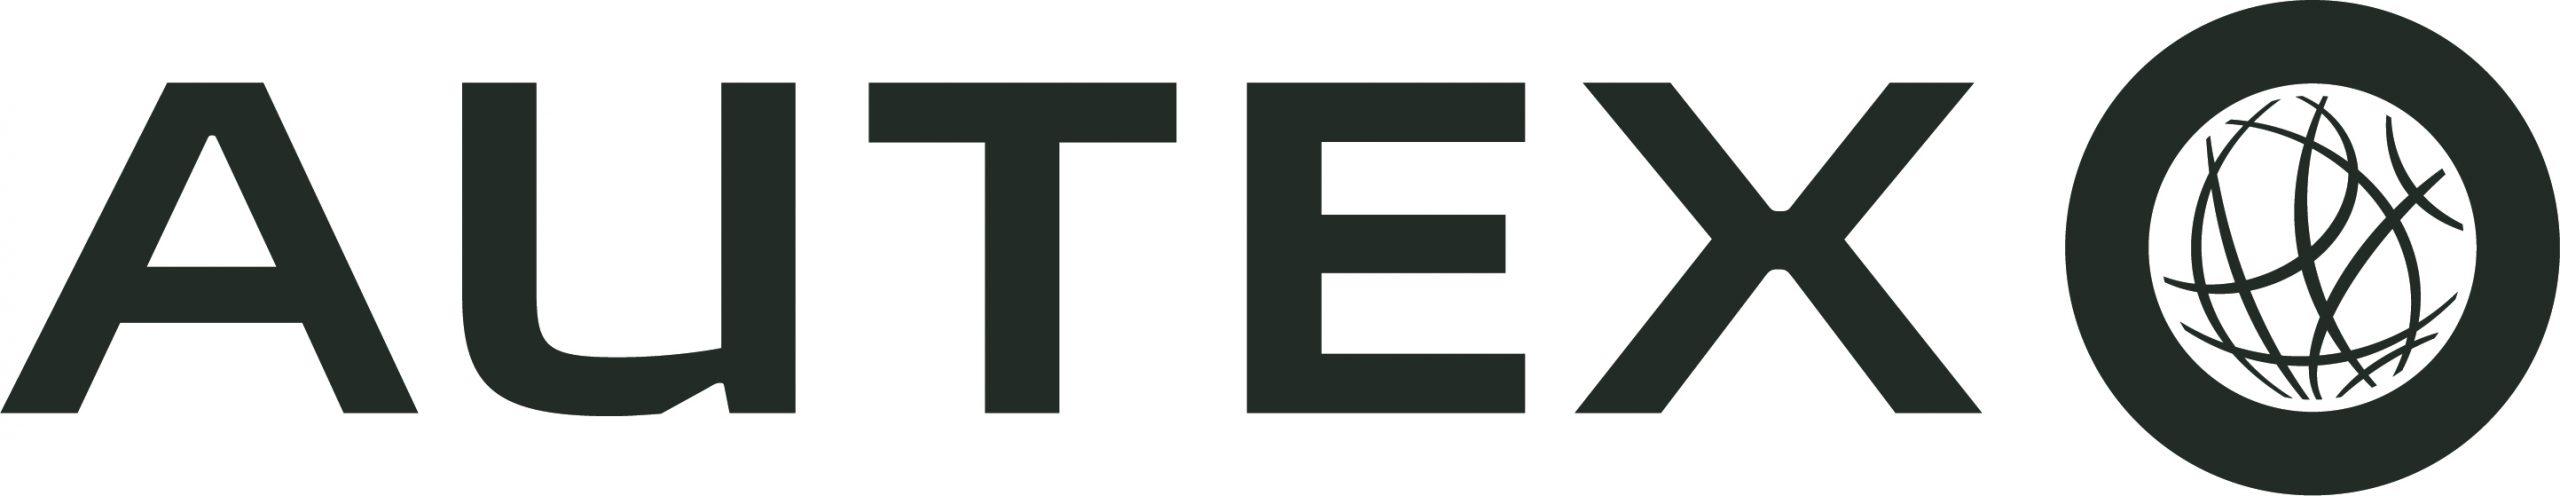 Autex Acoustics Ltd